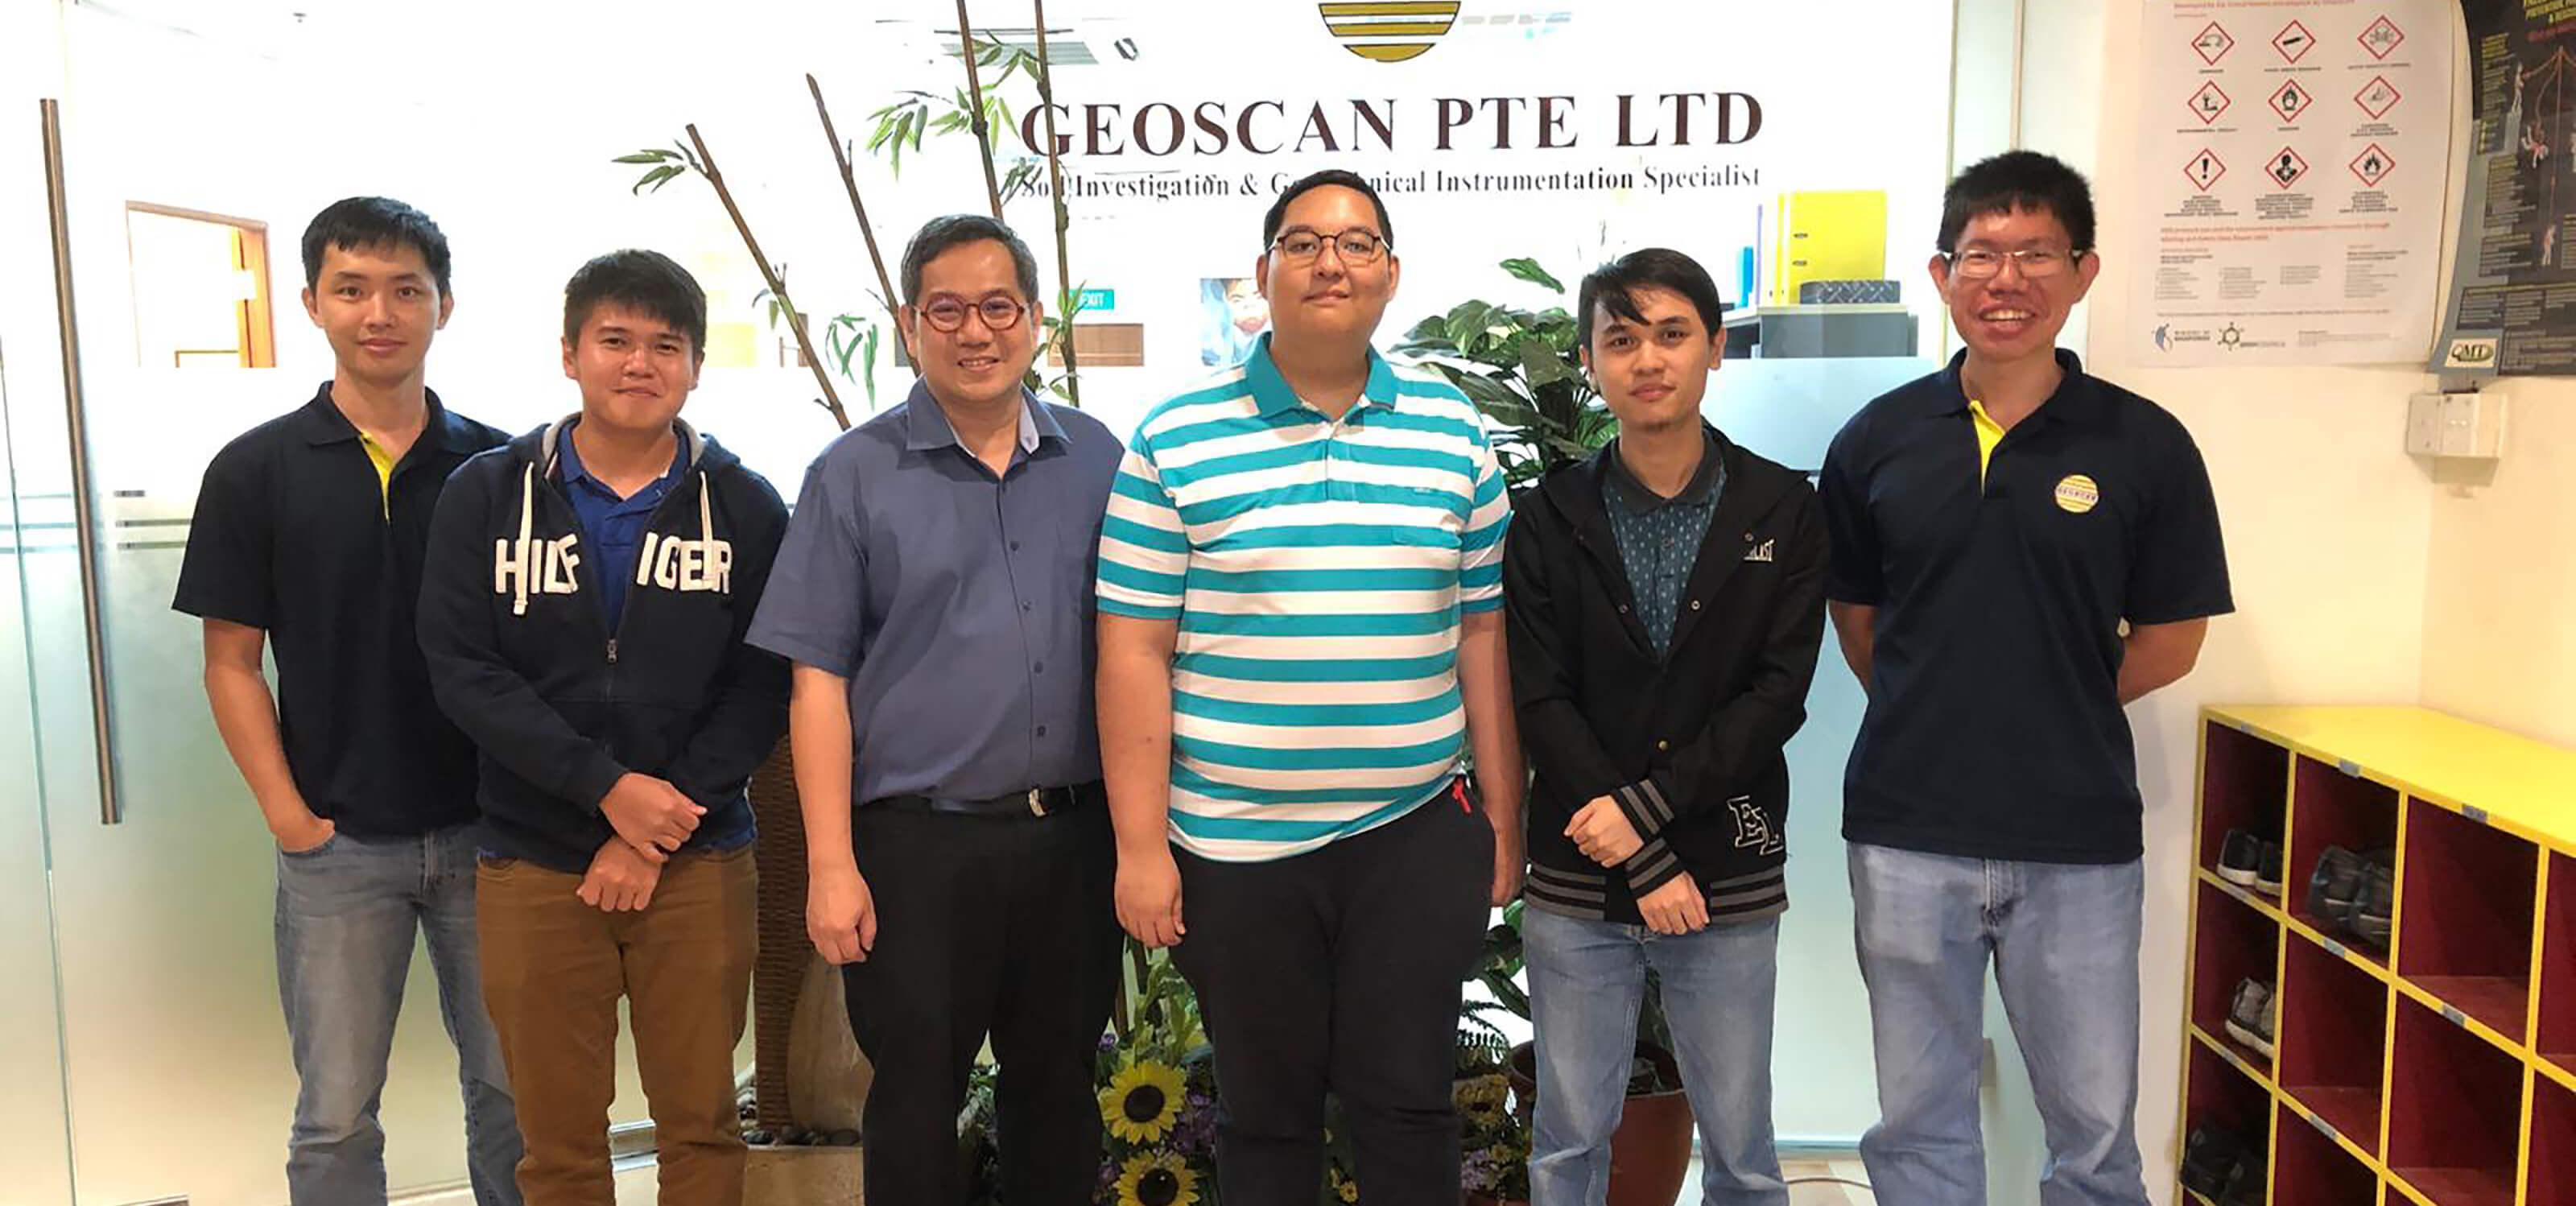 Group photo with SIT-DigiPen (Singapore) student interns Wazirullah Bin Rumzi and Zachary Ko with four Geoscan employees